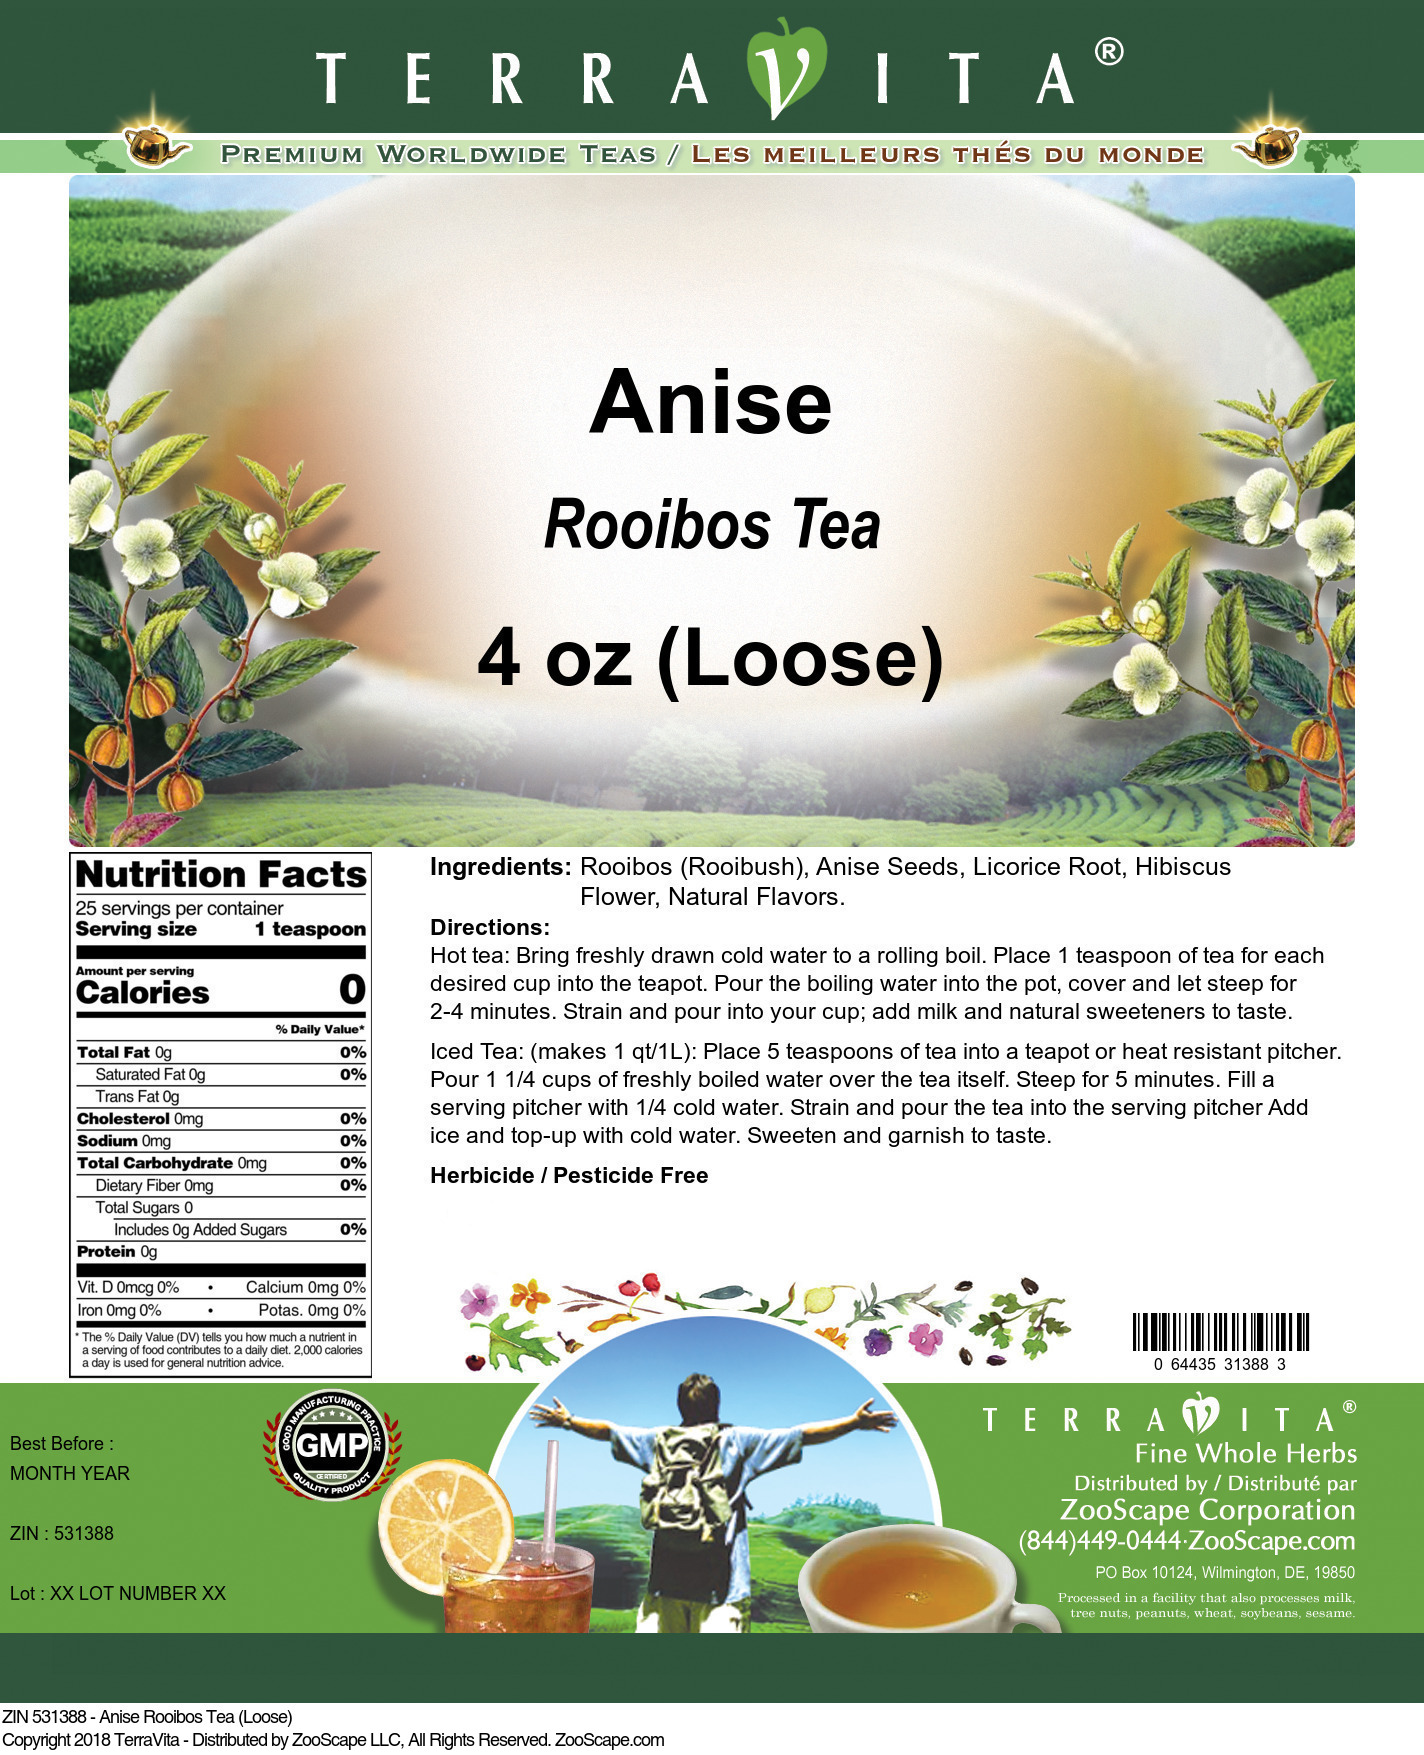 Anise Rooibos Tea (Loose)